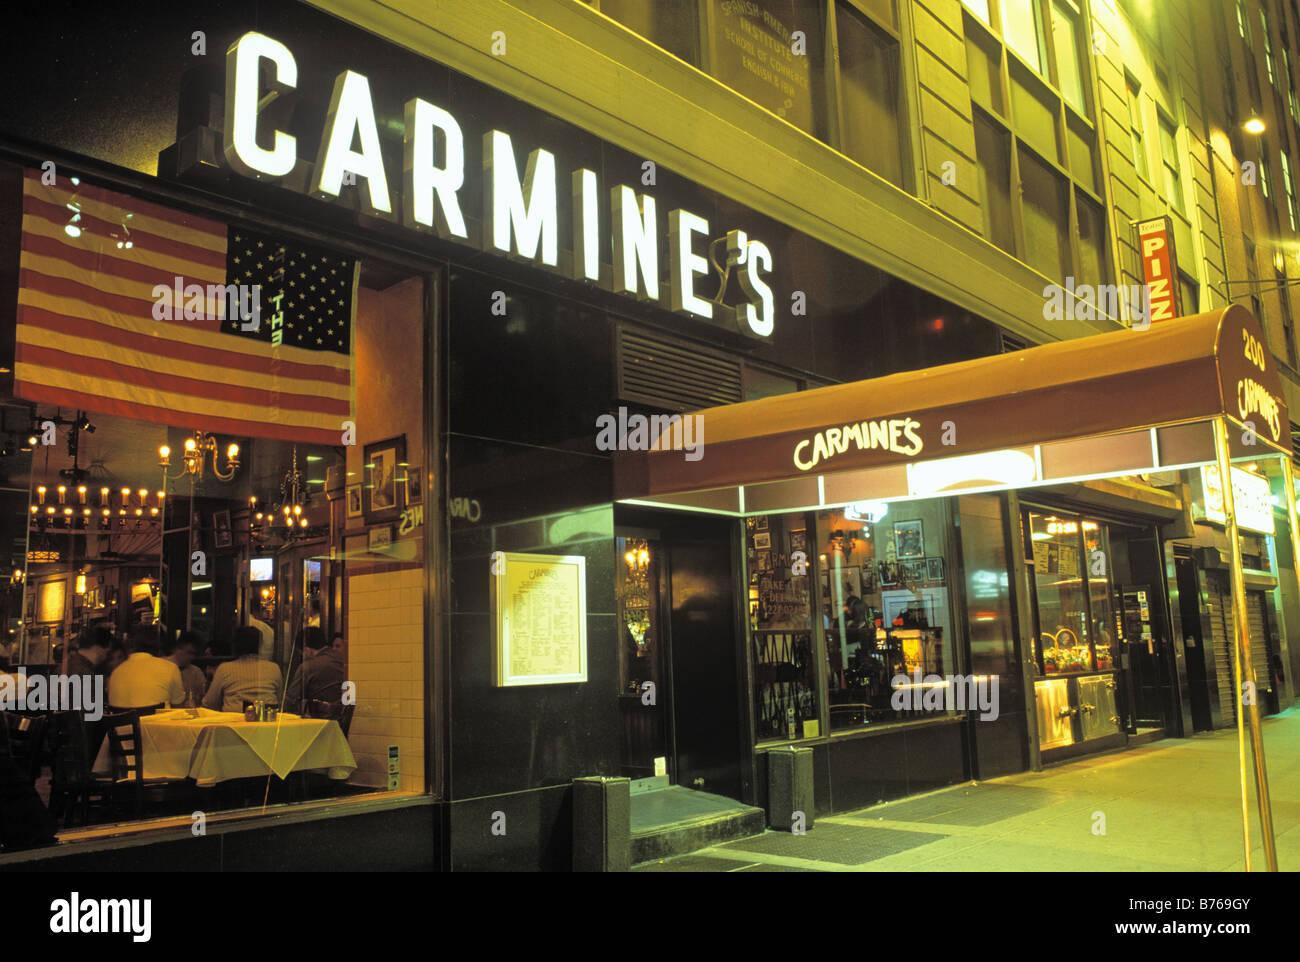 Carmine 39 s 44th street times square manhattan new york for Carmines nyc